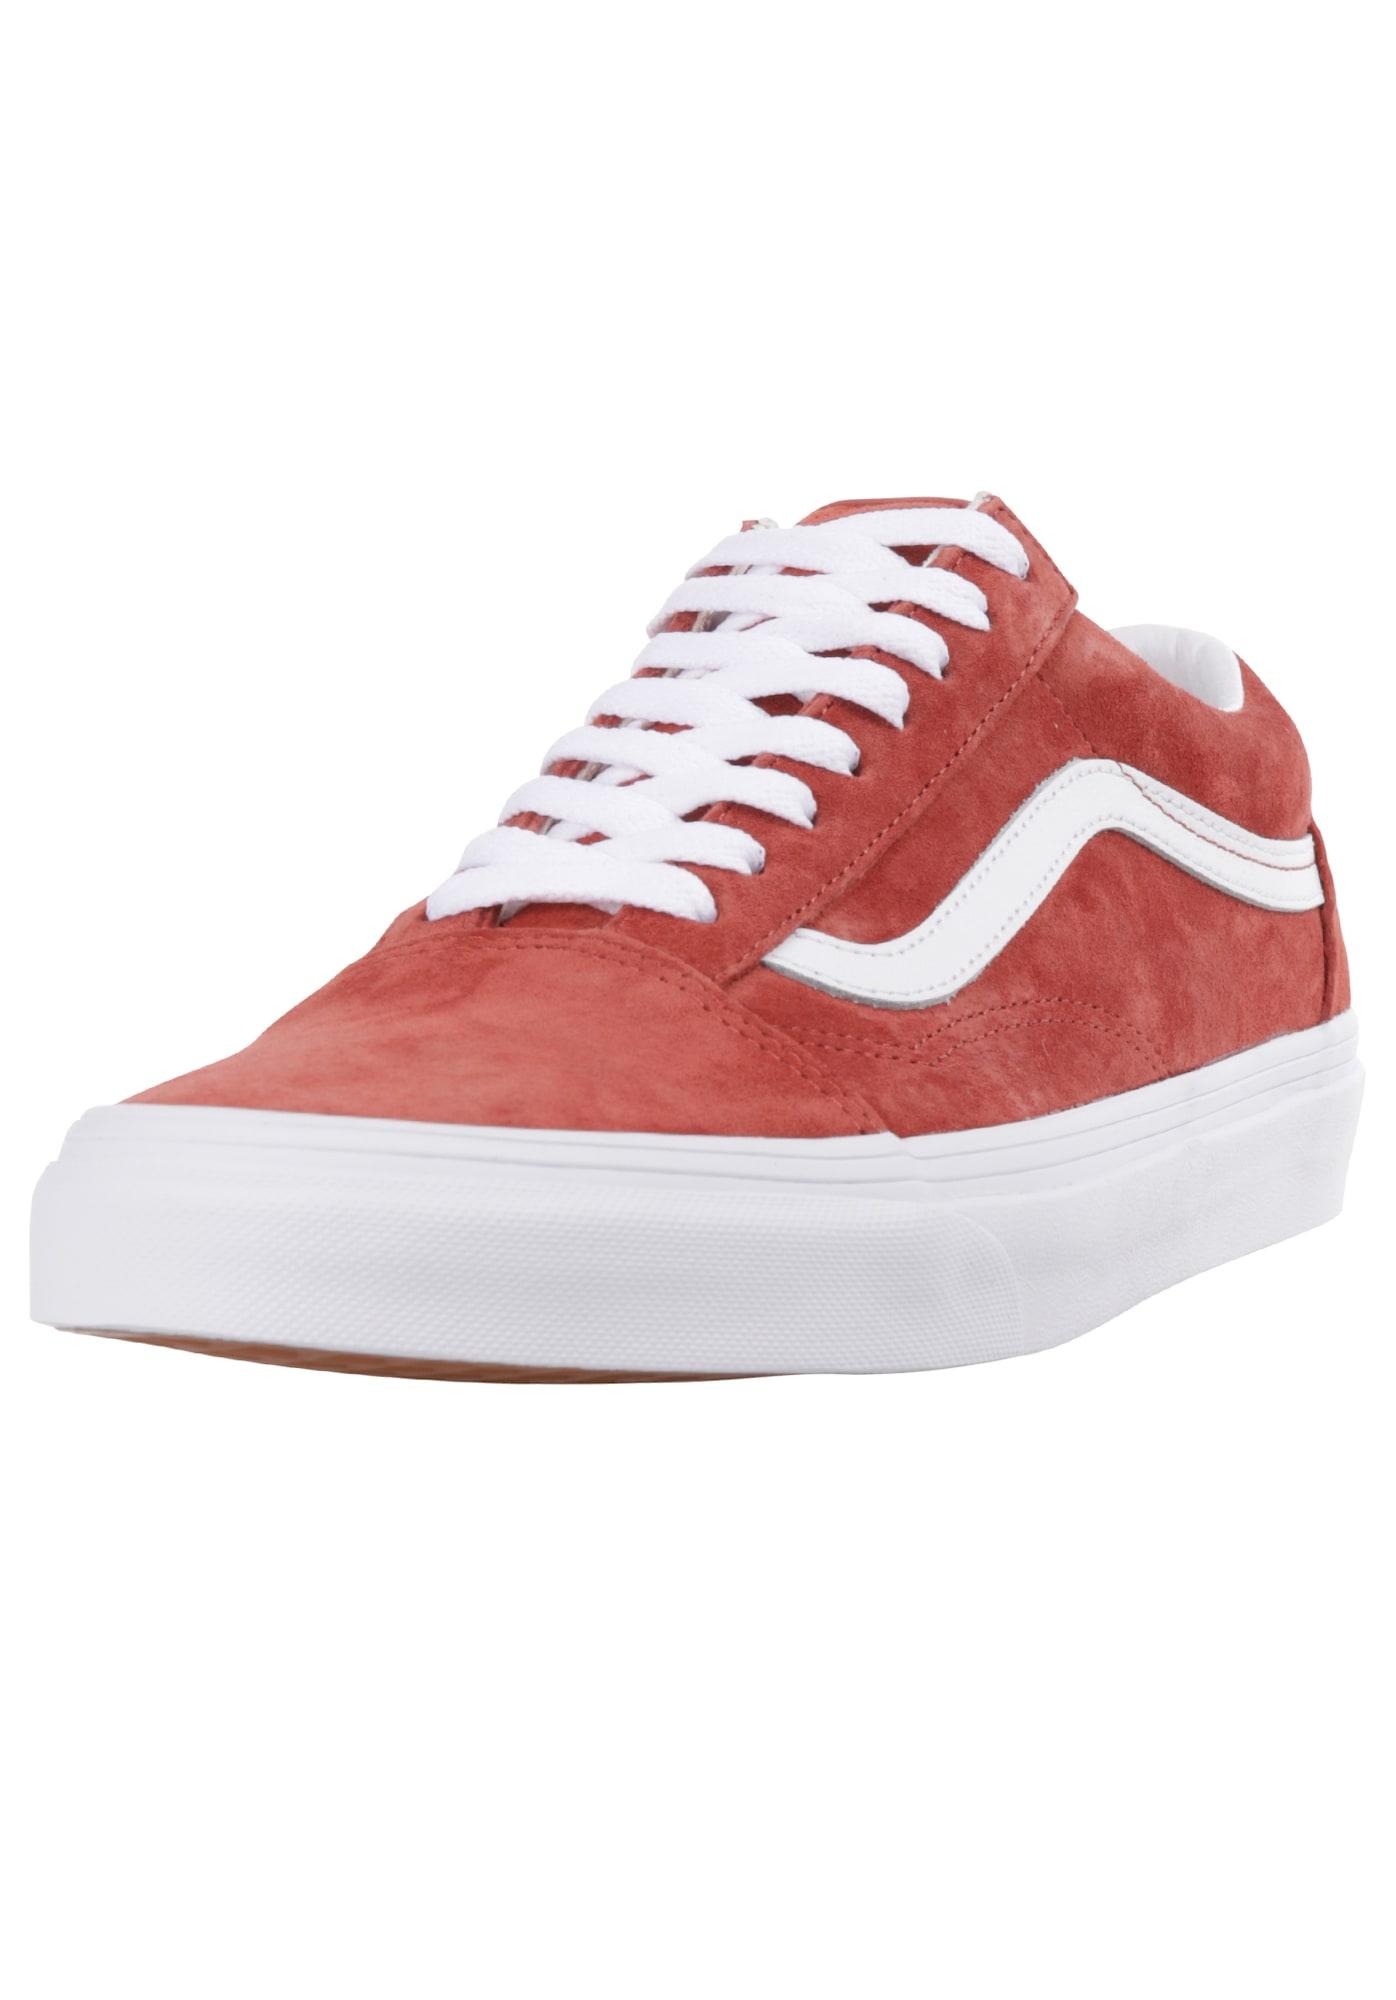 on sale aca78 de8a5 AboutYou Herren Vans Sneaker 'Old Skool' rot, weiß | 00193394053841